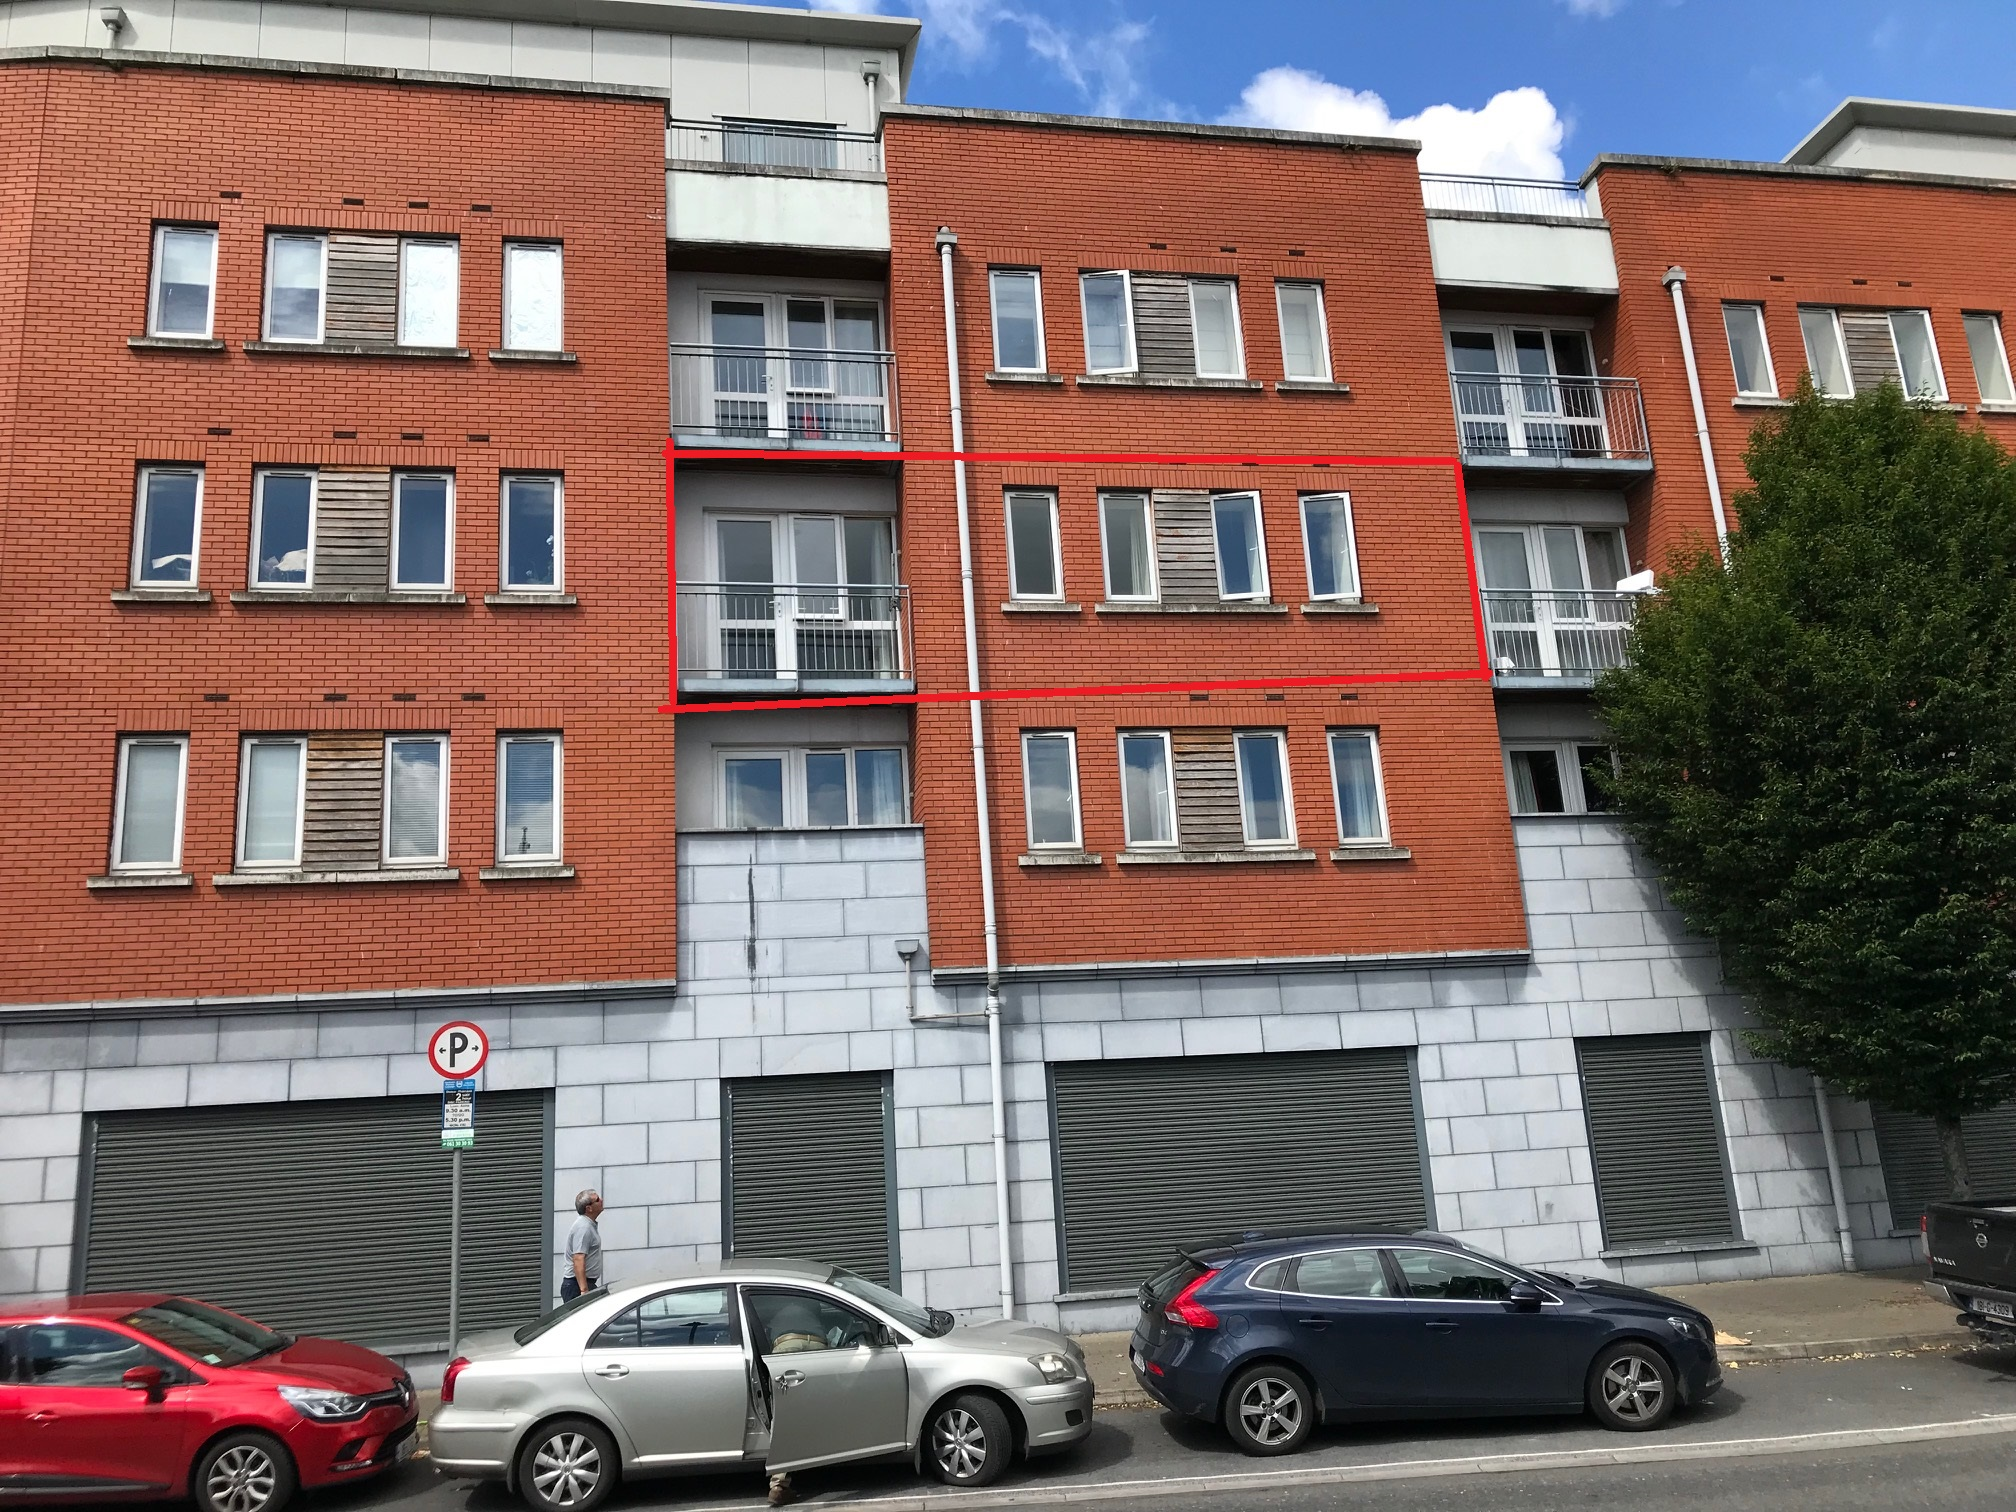 203 Abbey River Court, Limerick, Limerick City, Limerick City Centre